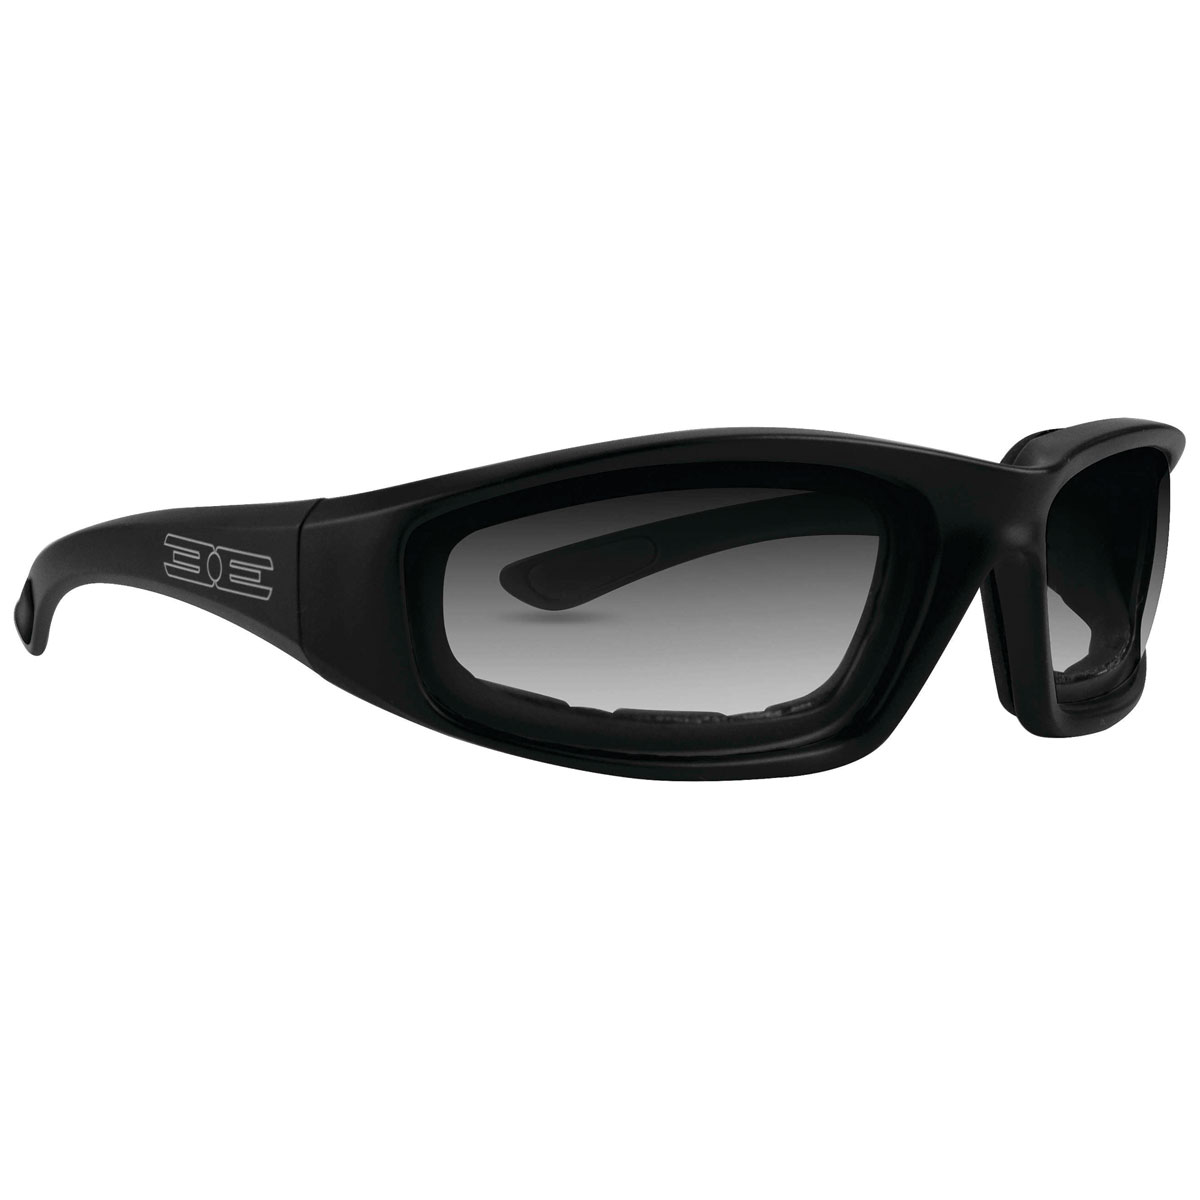 Epoch Eyewear Foam Photochromic Sunglasses with Clear to Smoke Lens